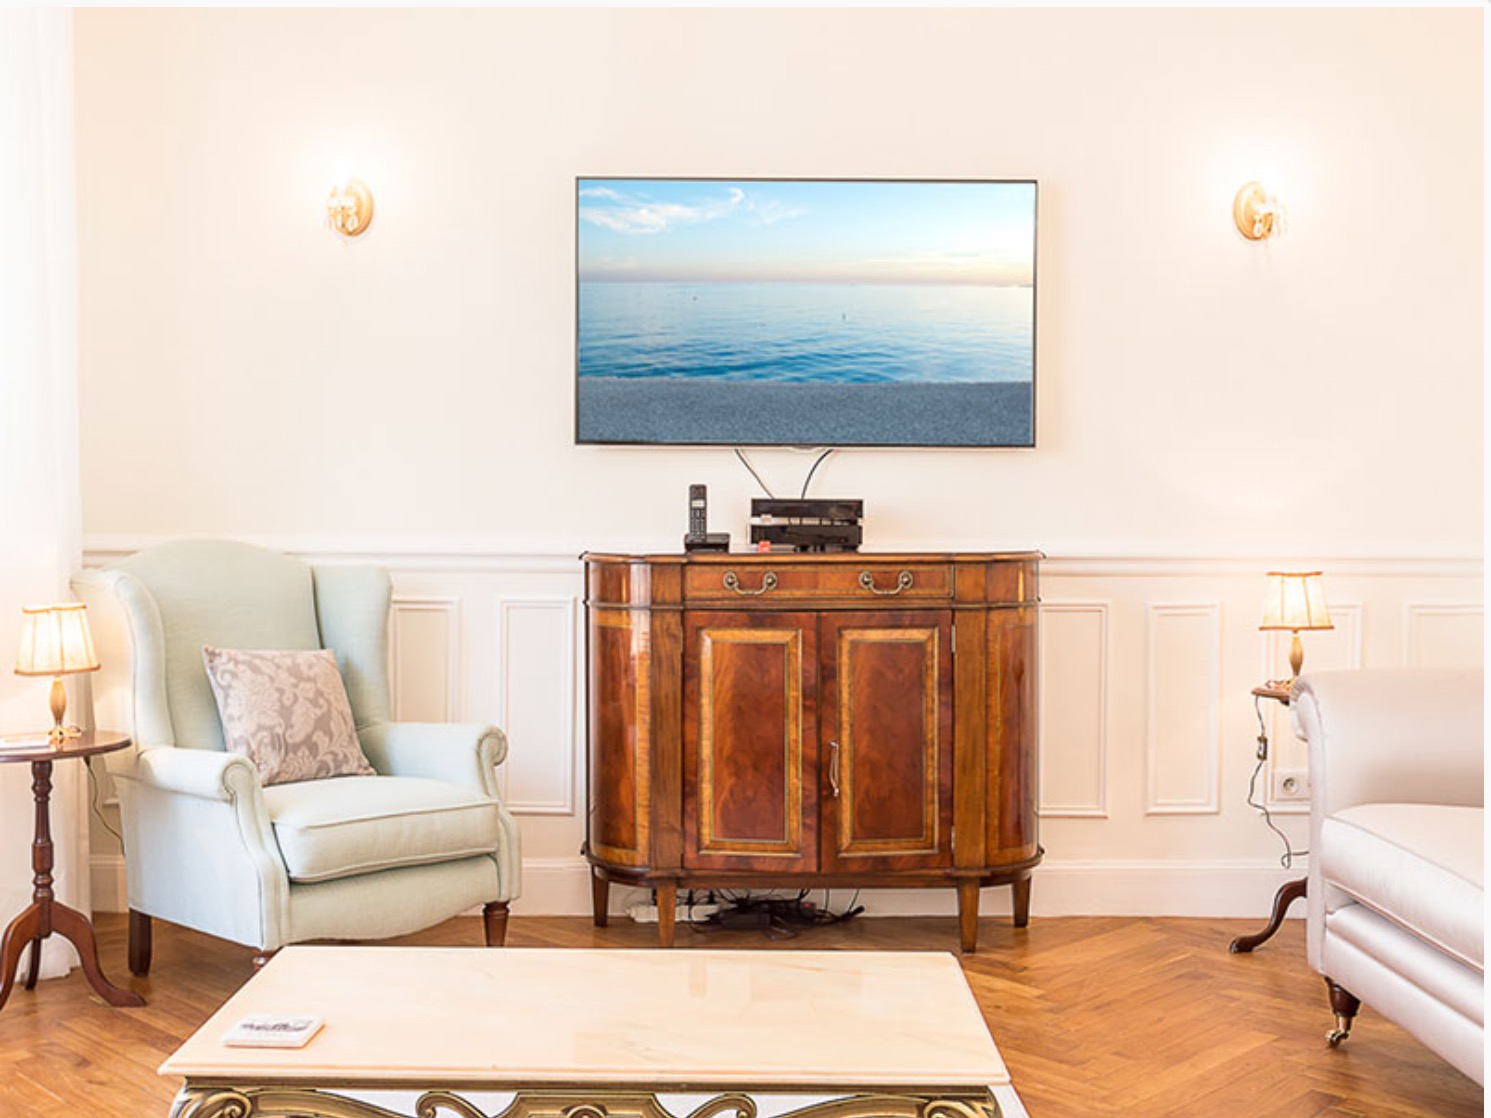 Carre d\'Or, Nice — Nice Home Interiors Nice Home Interiors